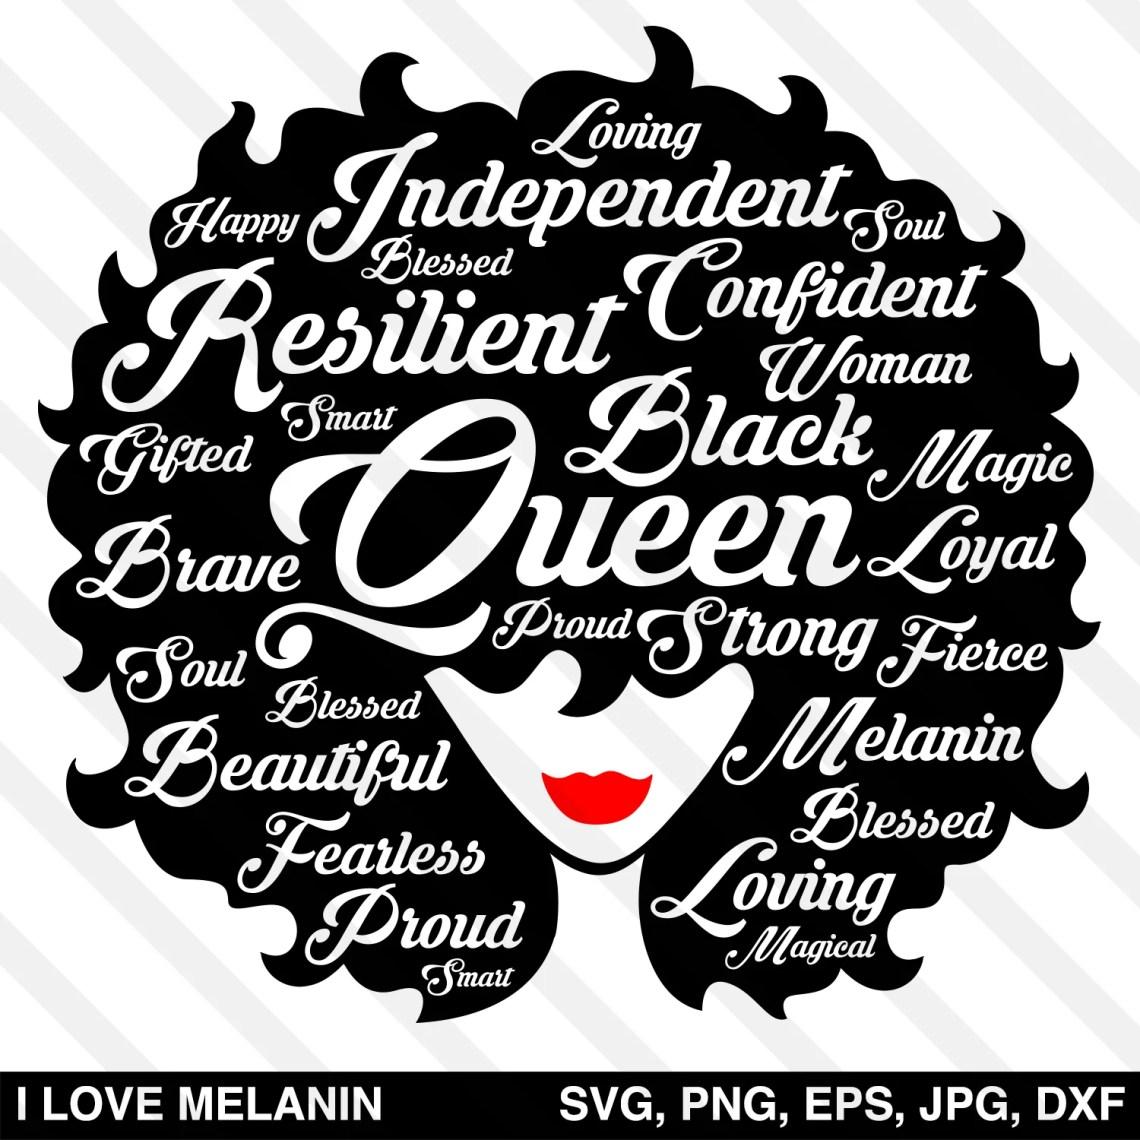 Download Black Queen Afro Woman SVG - I Love Melanin